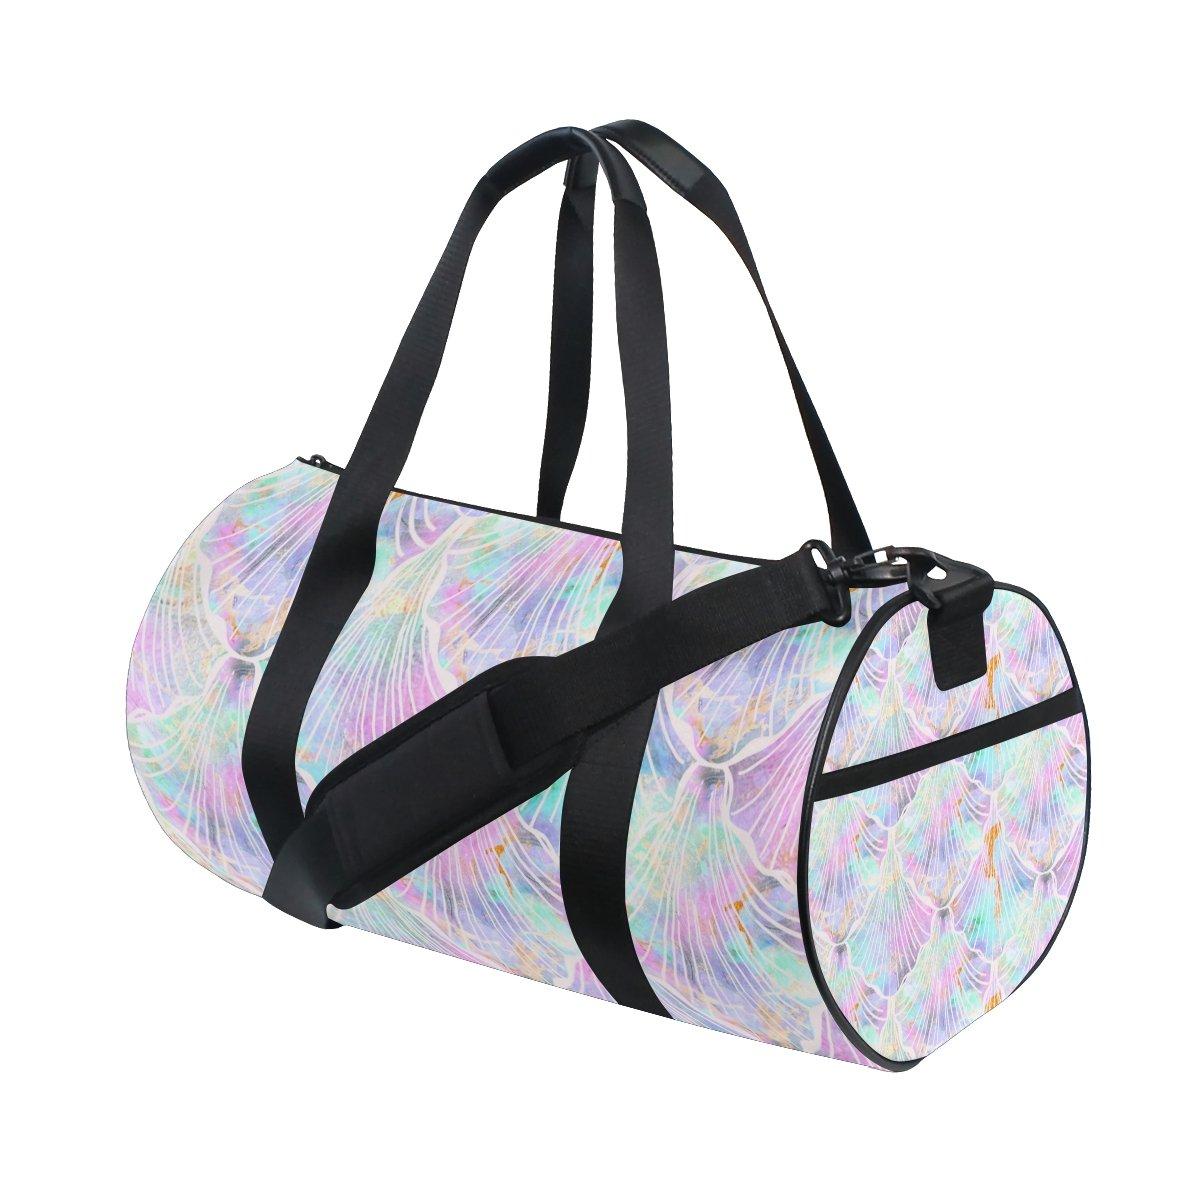 Unisex Pastel Mermaid Scales Gym Sport Team Issue Duffel Bag by Top Carpenter